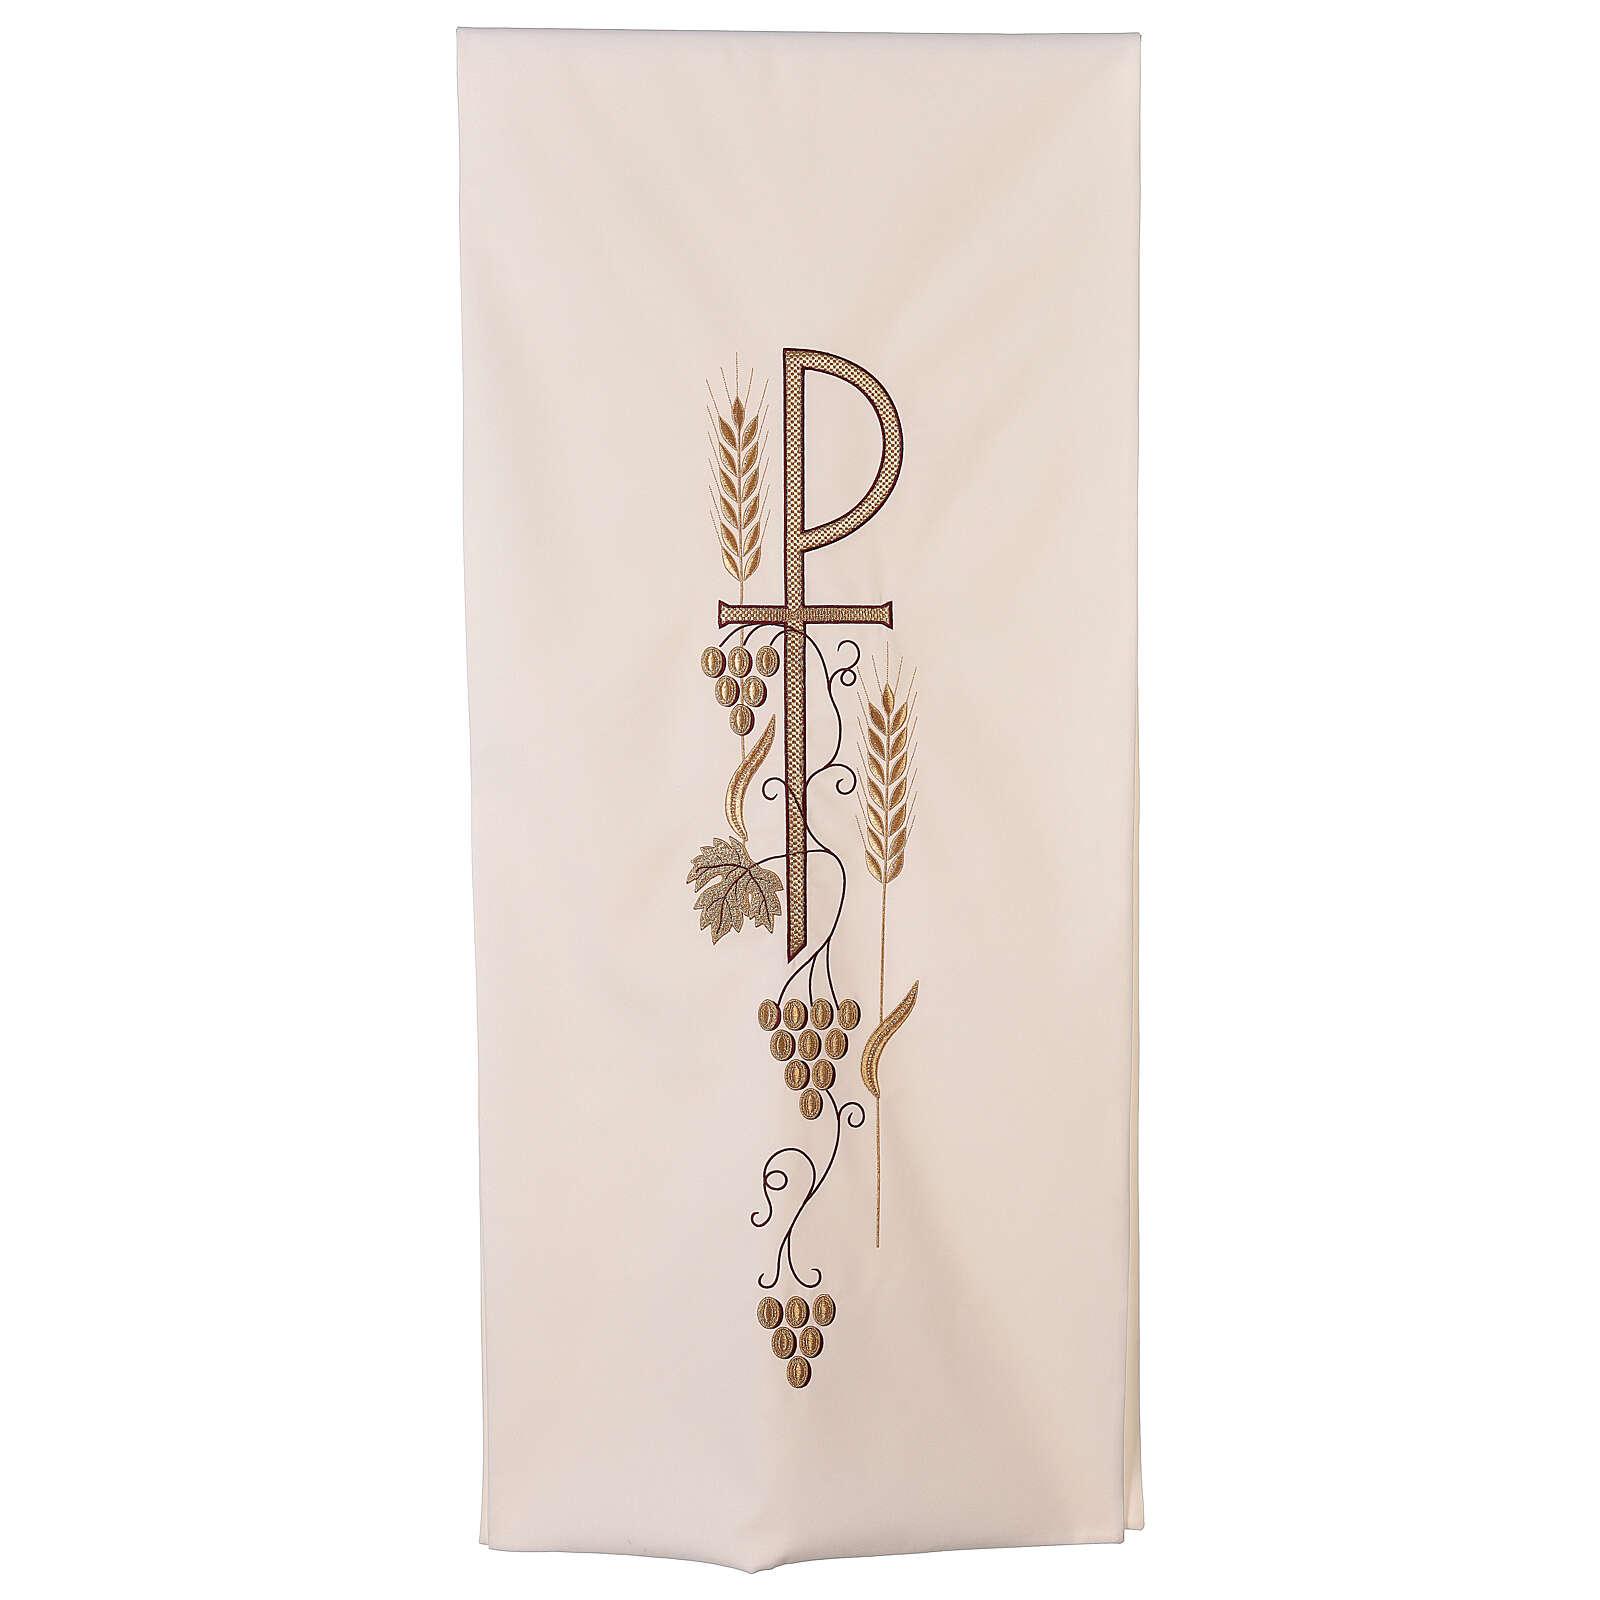 Coprileggio spighe foglia uva simbolo P 4